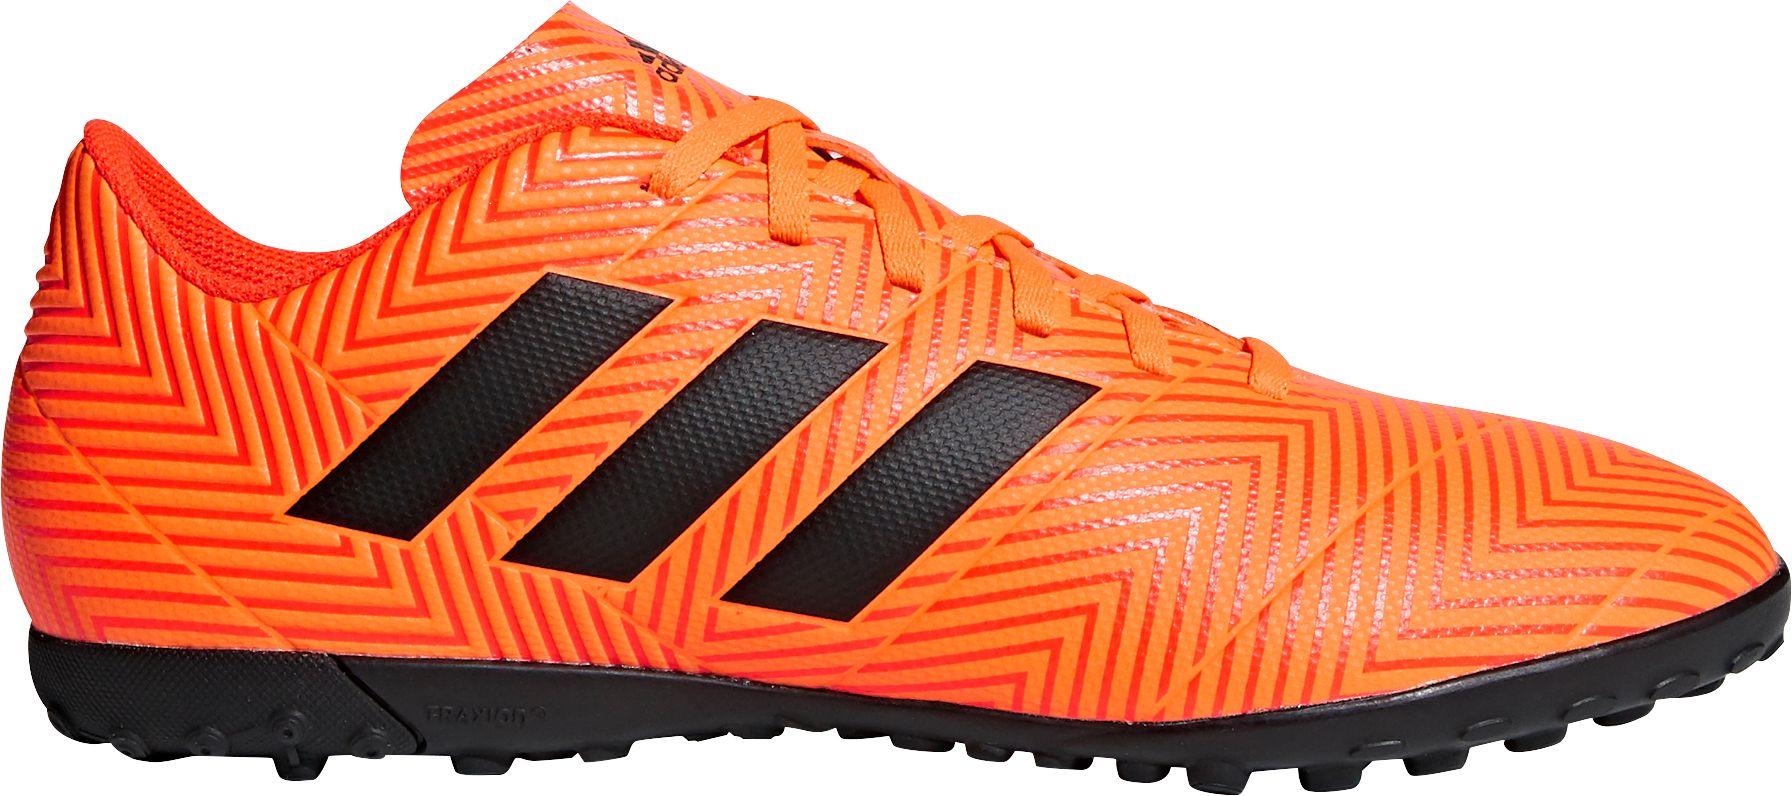 55ade2d458a5 adidas Men s Nemeziz Tango 18.4 TF Soccer Cleats